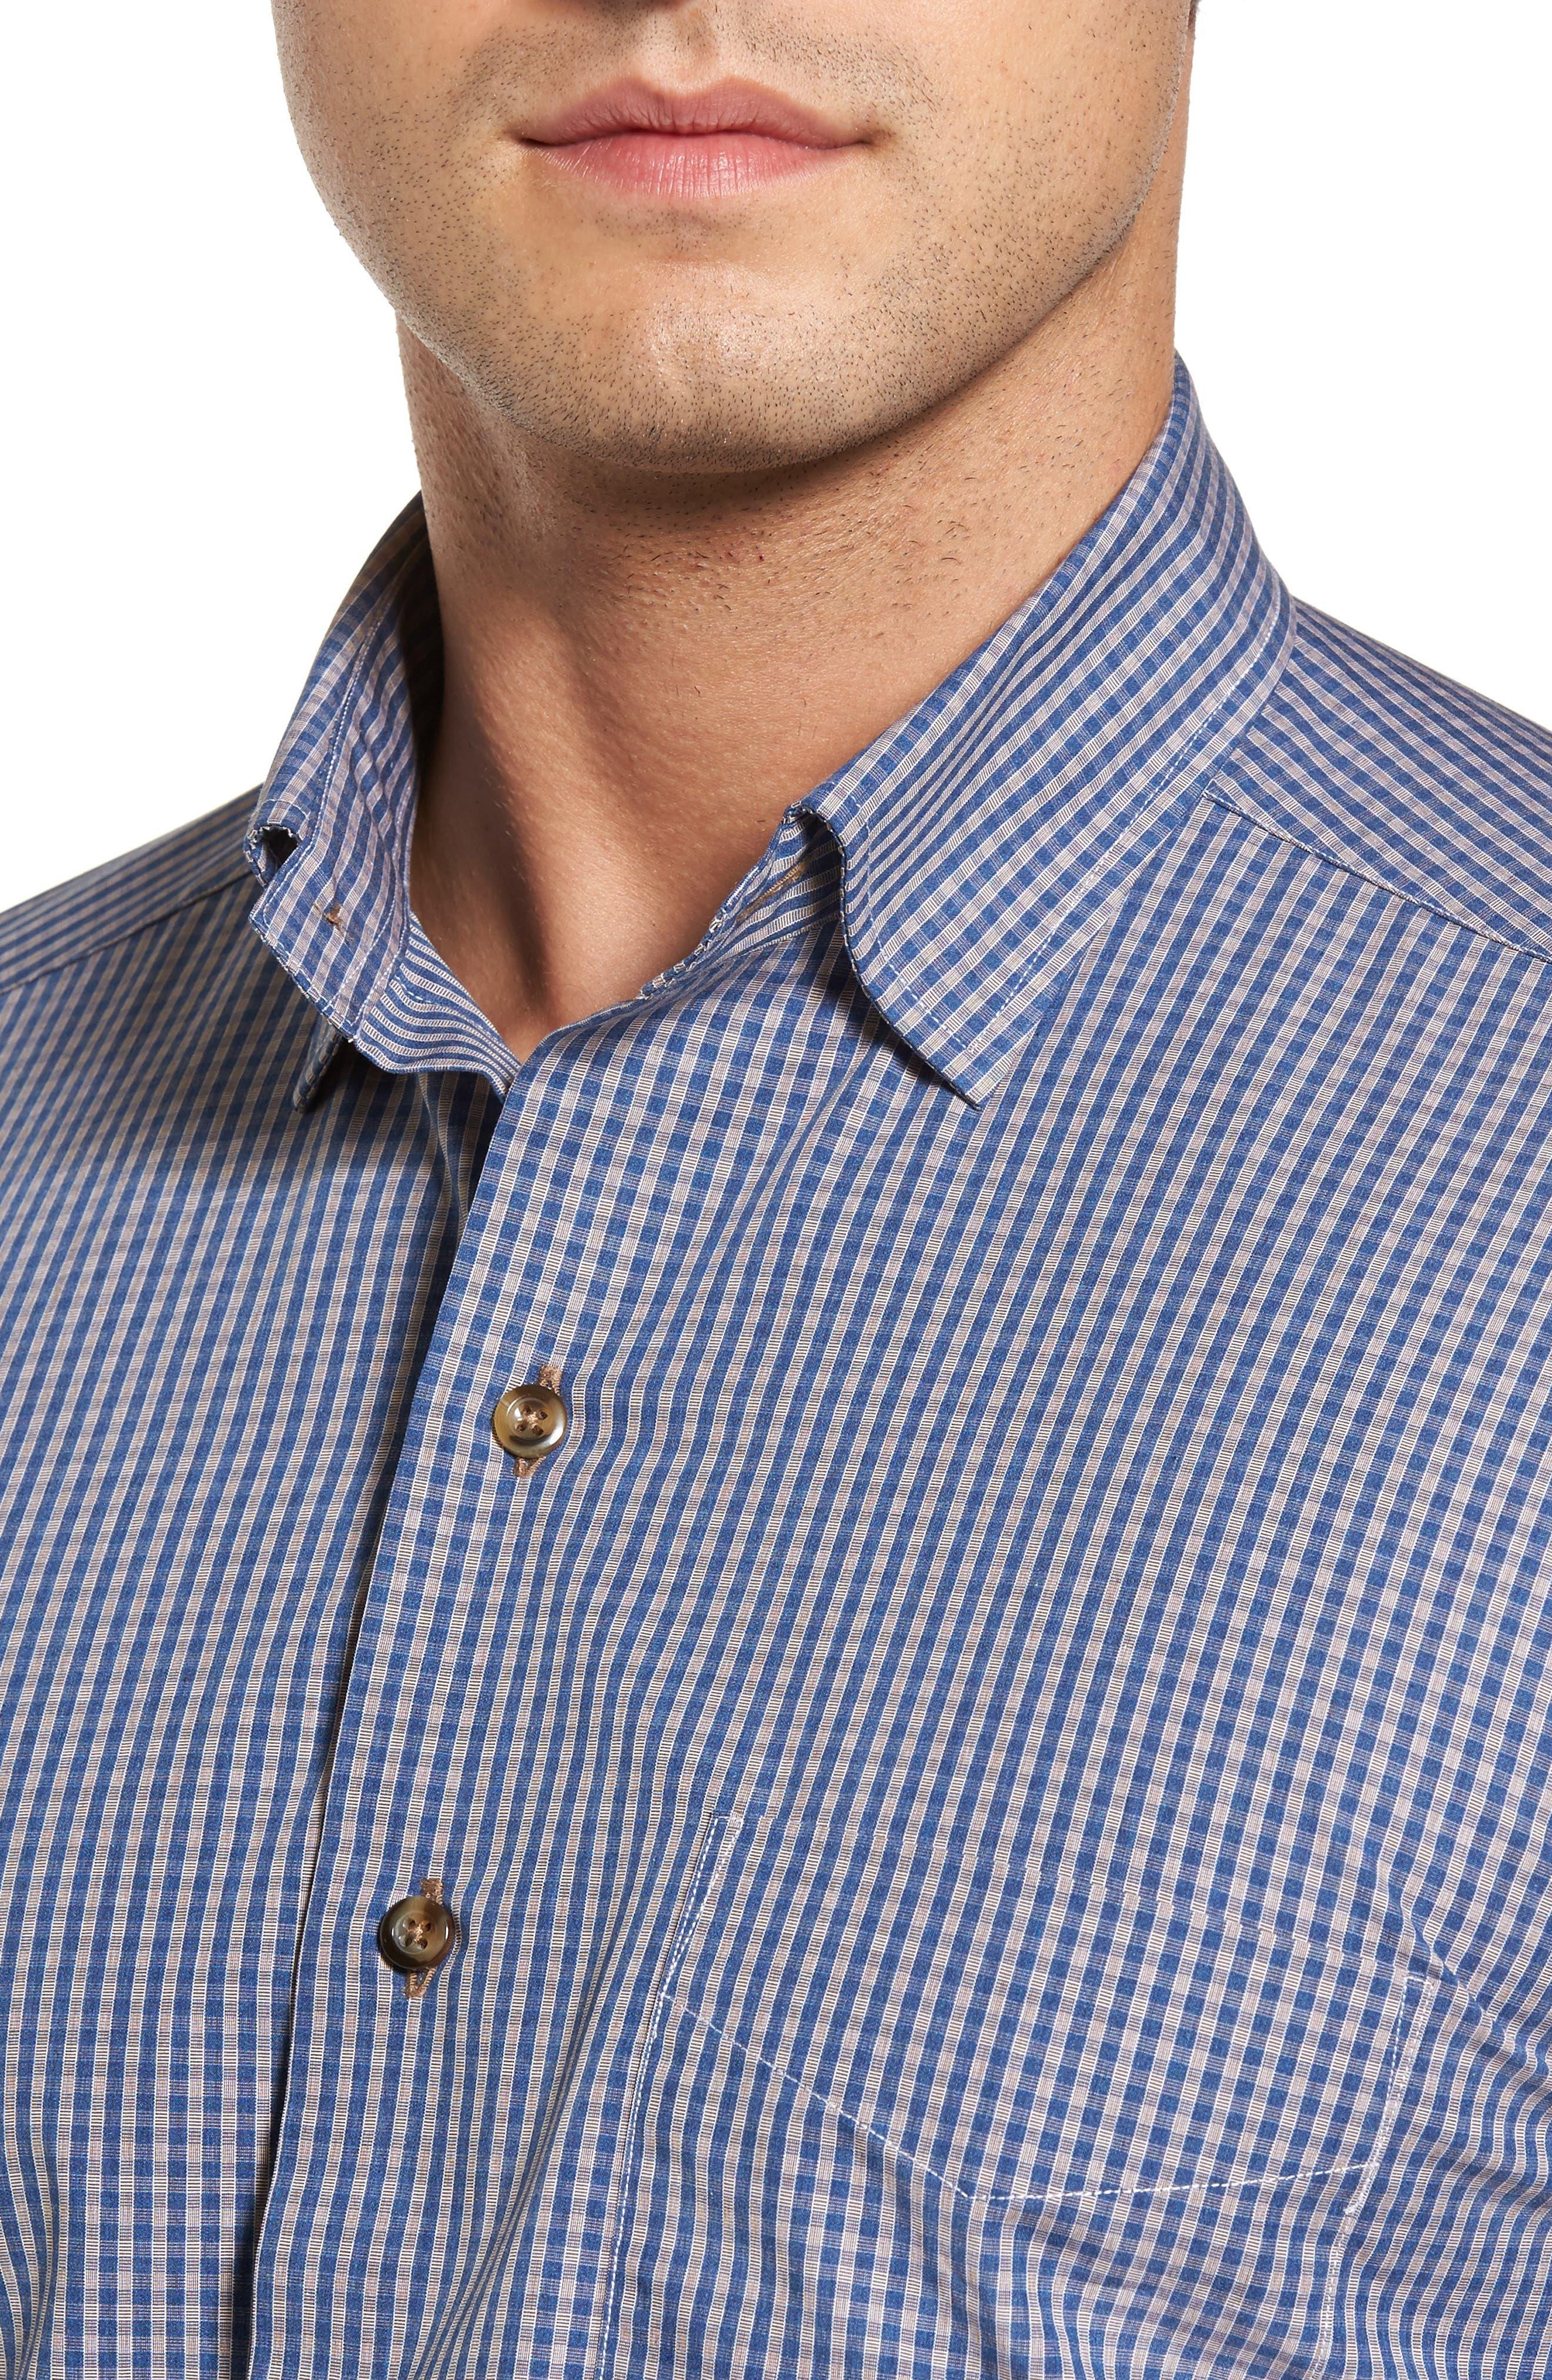 Regular Fit Check Sport Shirt,                             Alternate thumbnail 4, color,                             Navy/ Chocolate